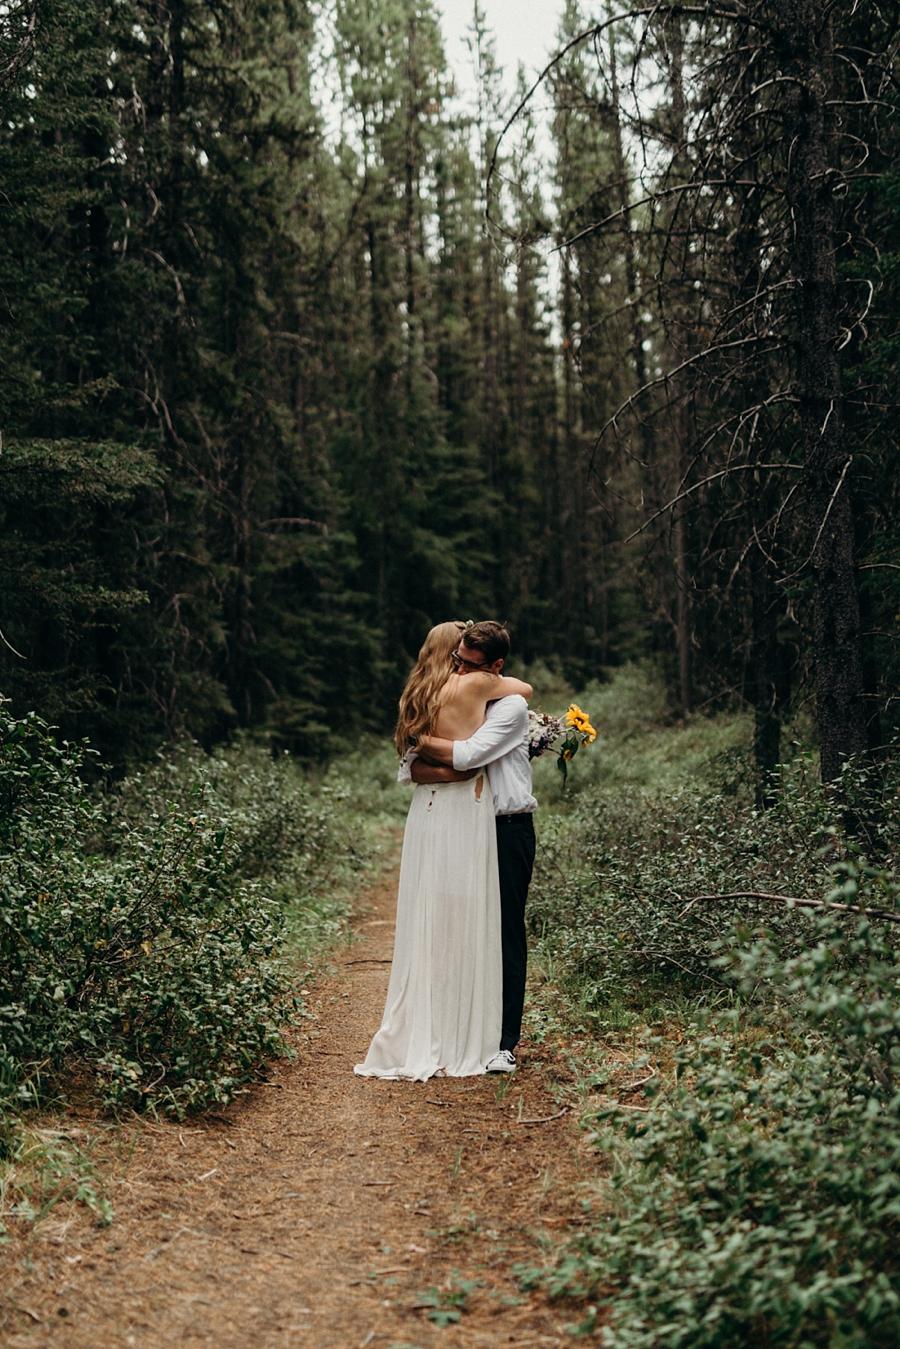 kaihla_tonai_intimate_wedding_elopement_photographer_7265.jpg